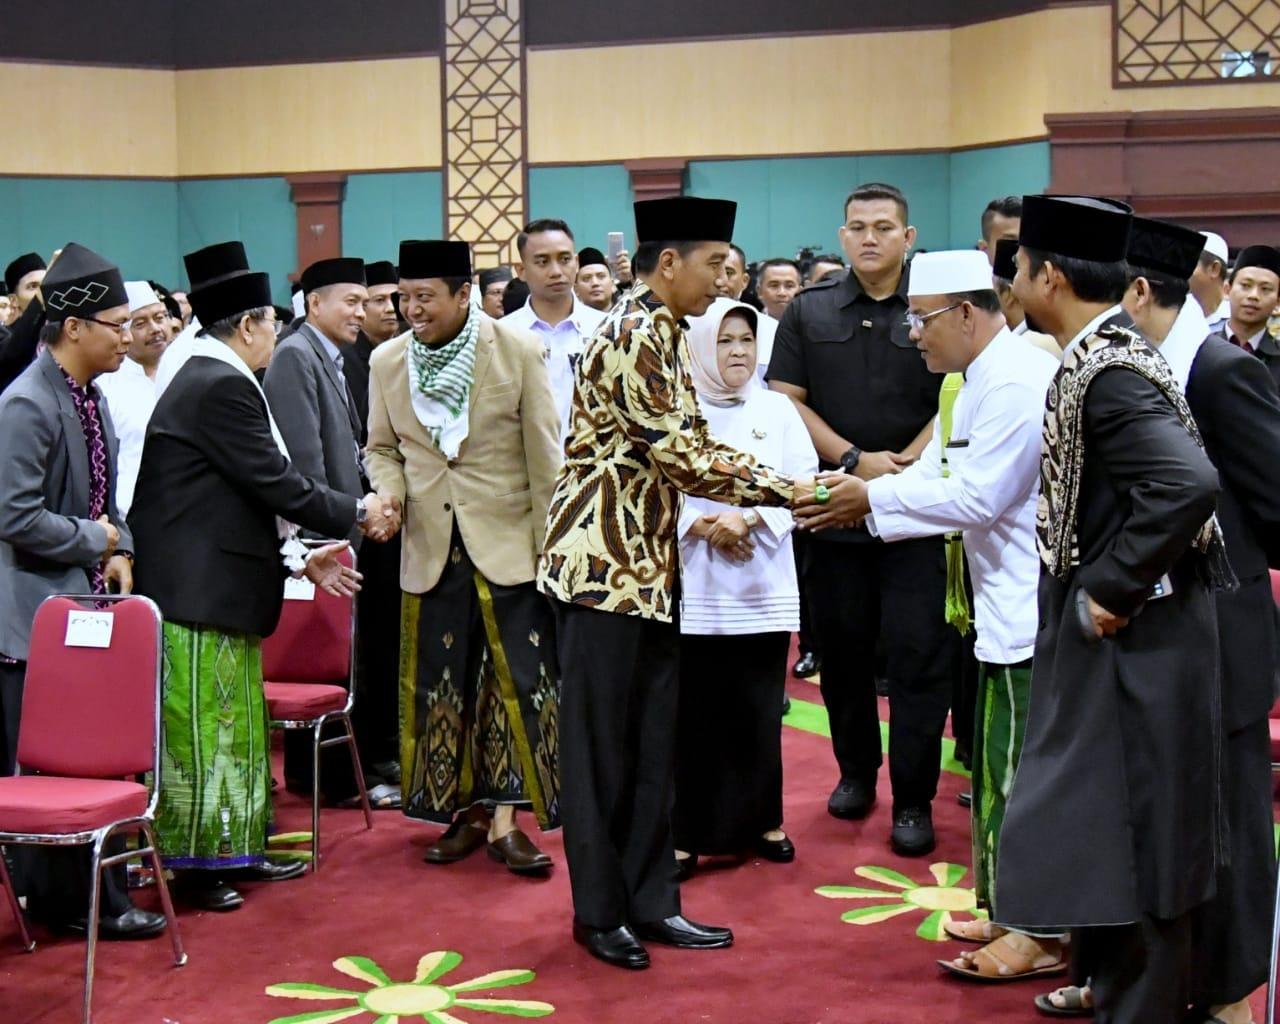 pembukaan-pendidikan-kader-ulama-pku-majelis-ulama-indonesia-mui-13